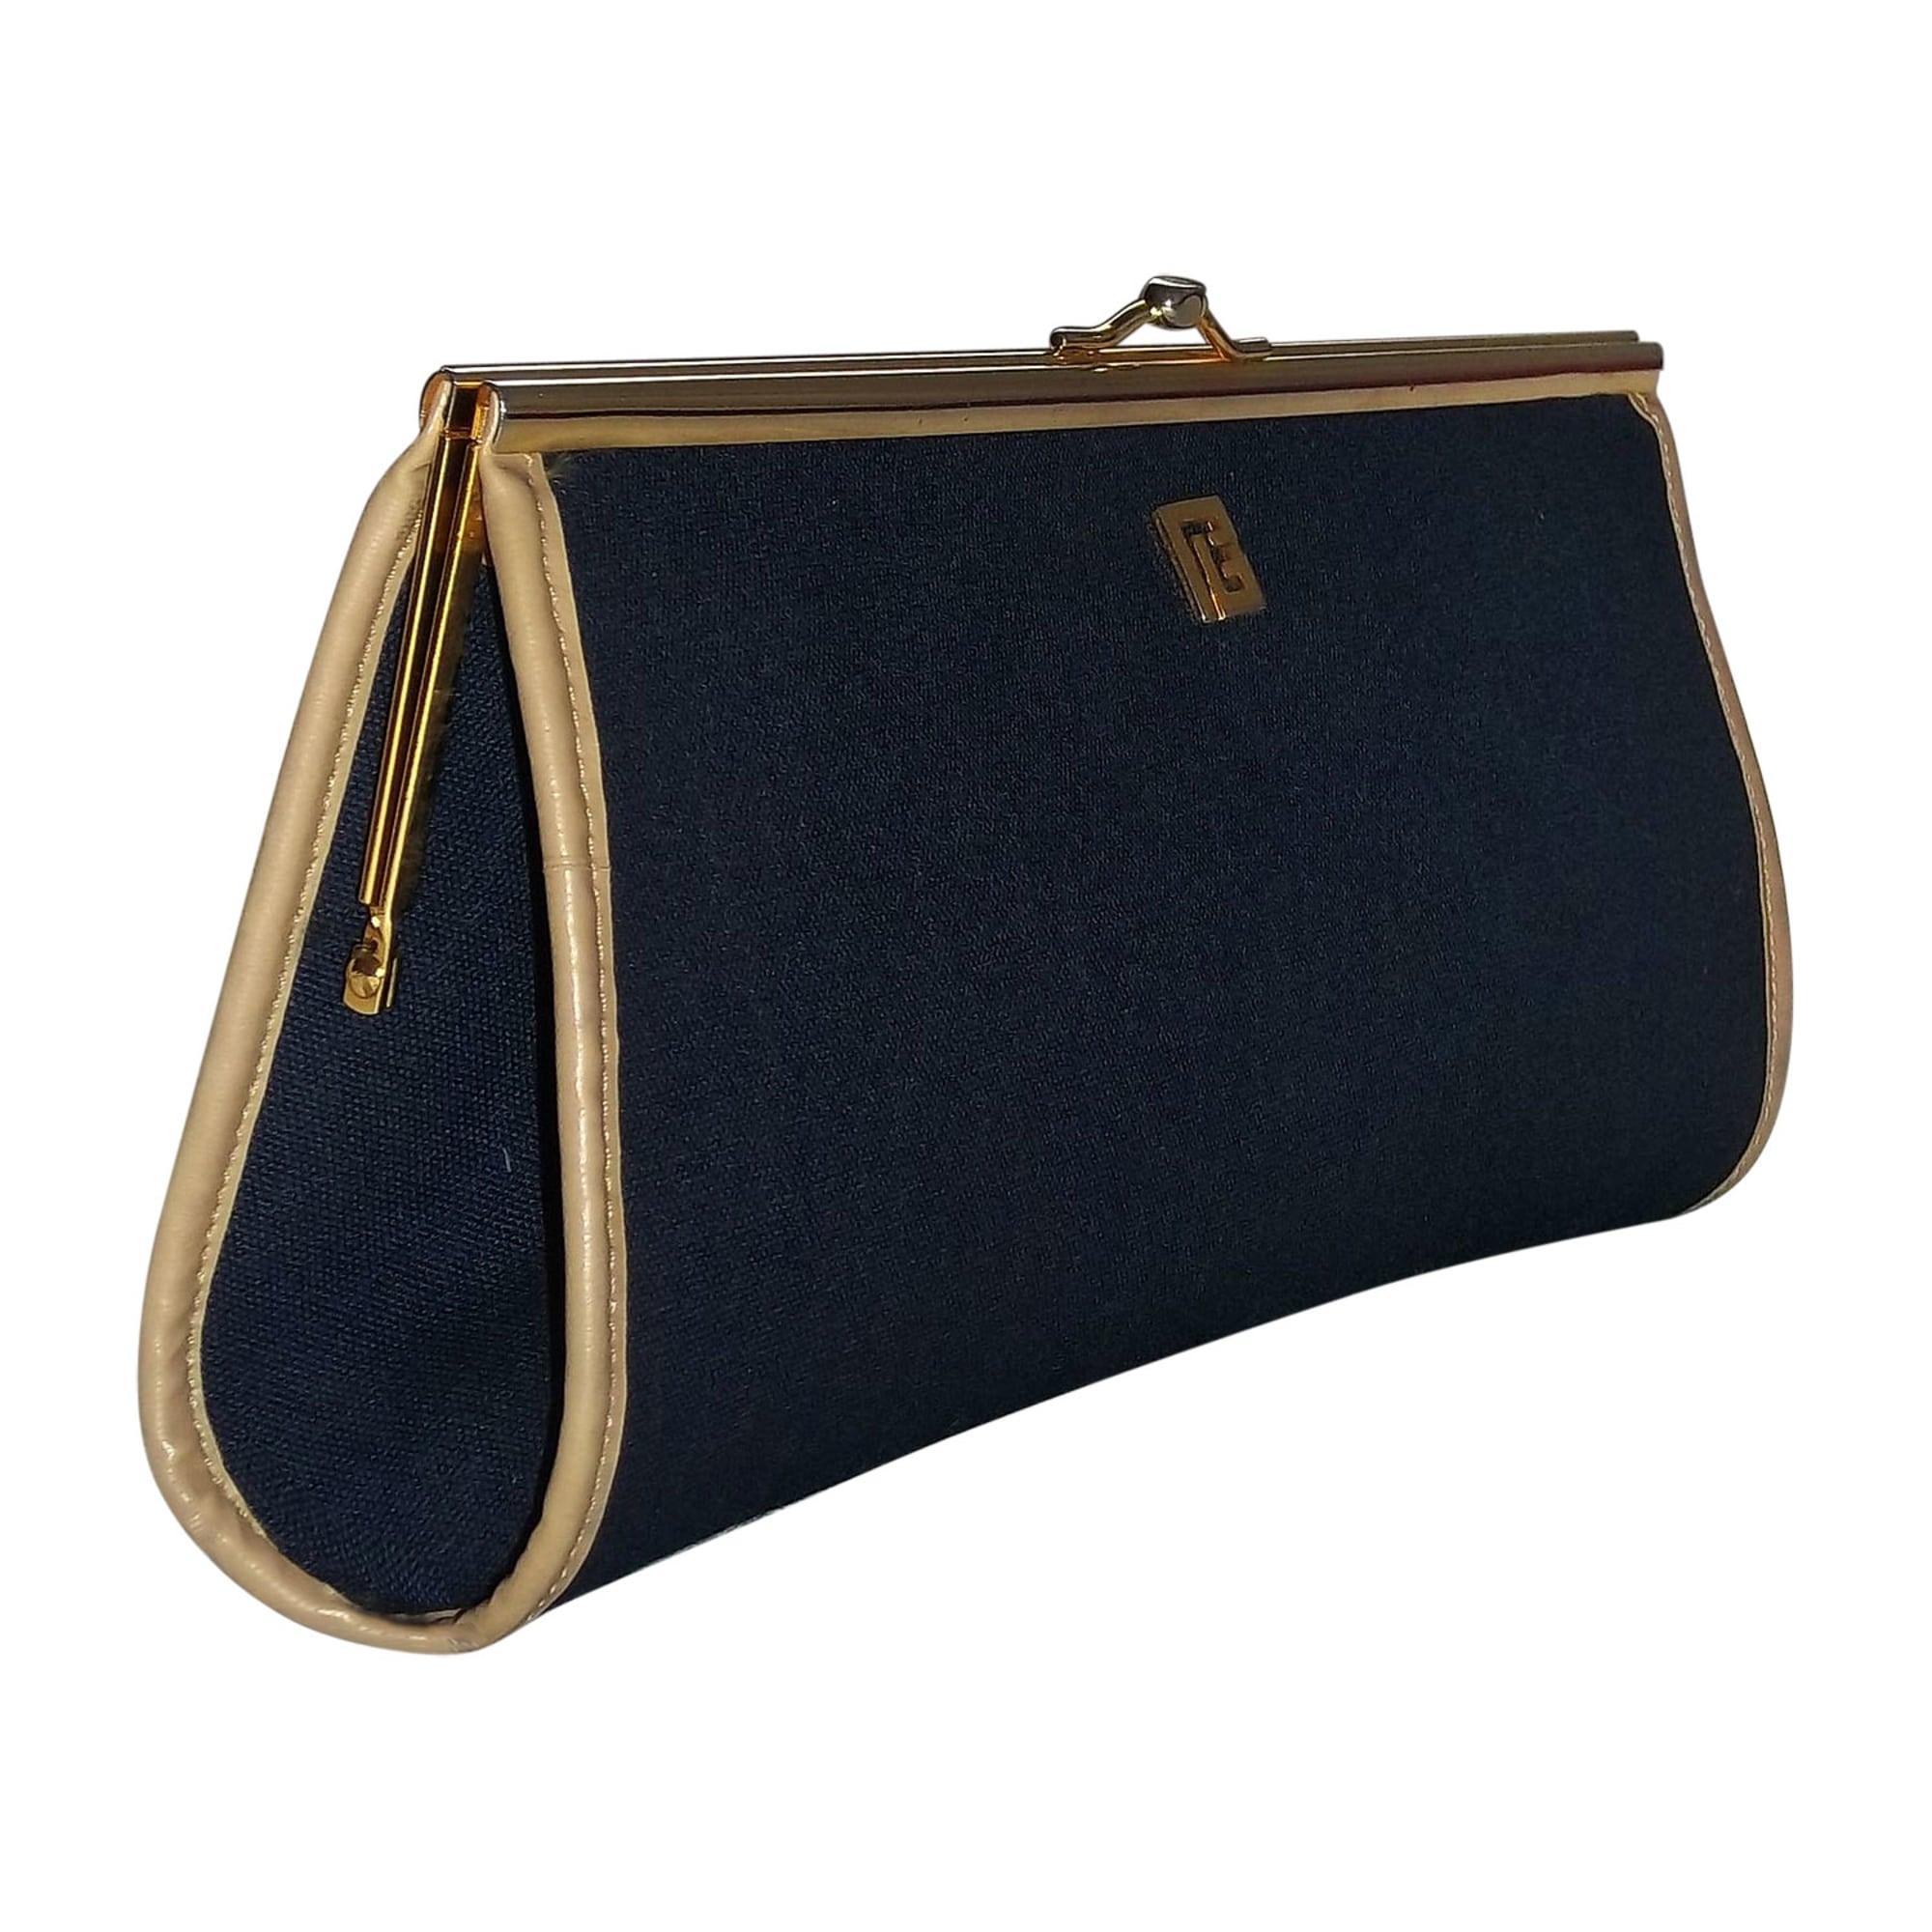 Sac 5214706 Cuir Pochette Bleu En Balmain redBoCx